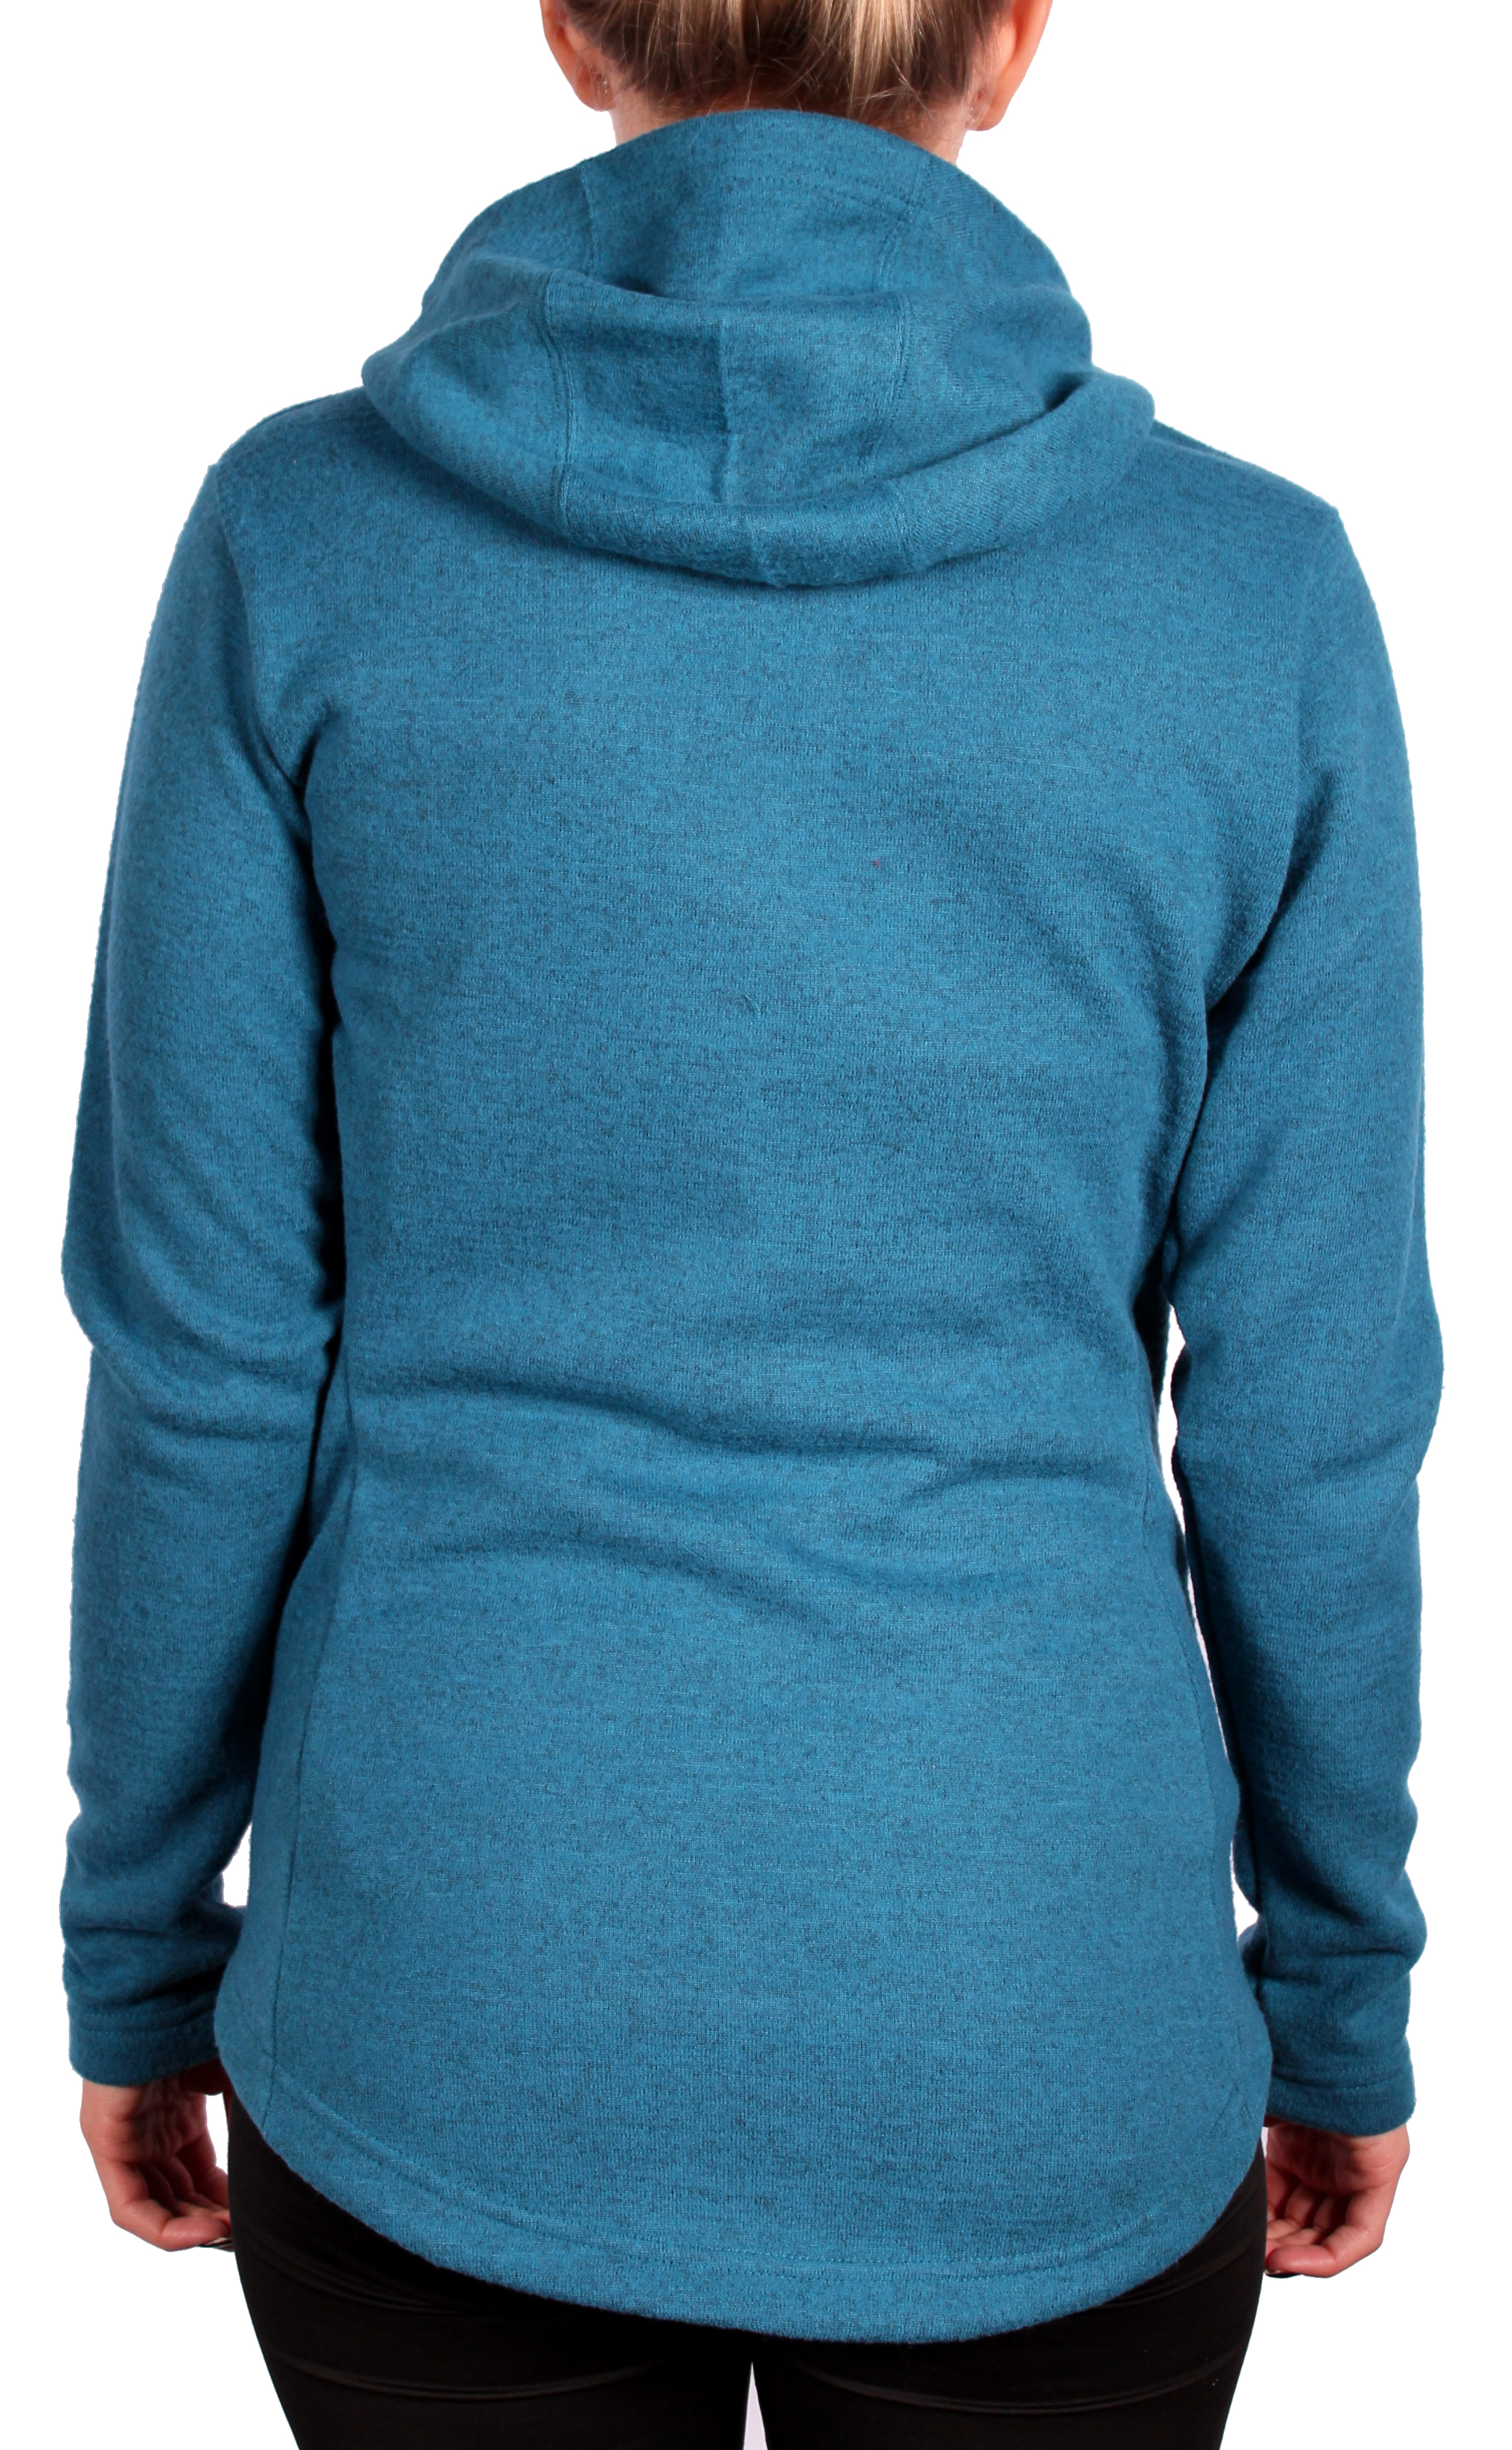 Bluza Aktywna Minette Fleece (Cerulean Heather)